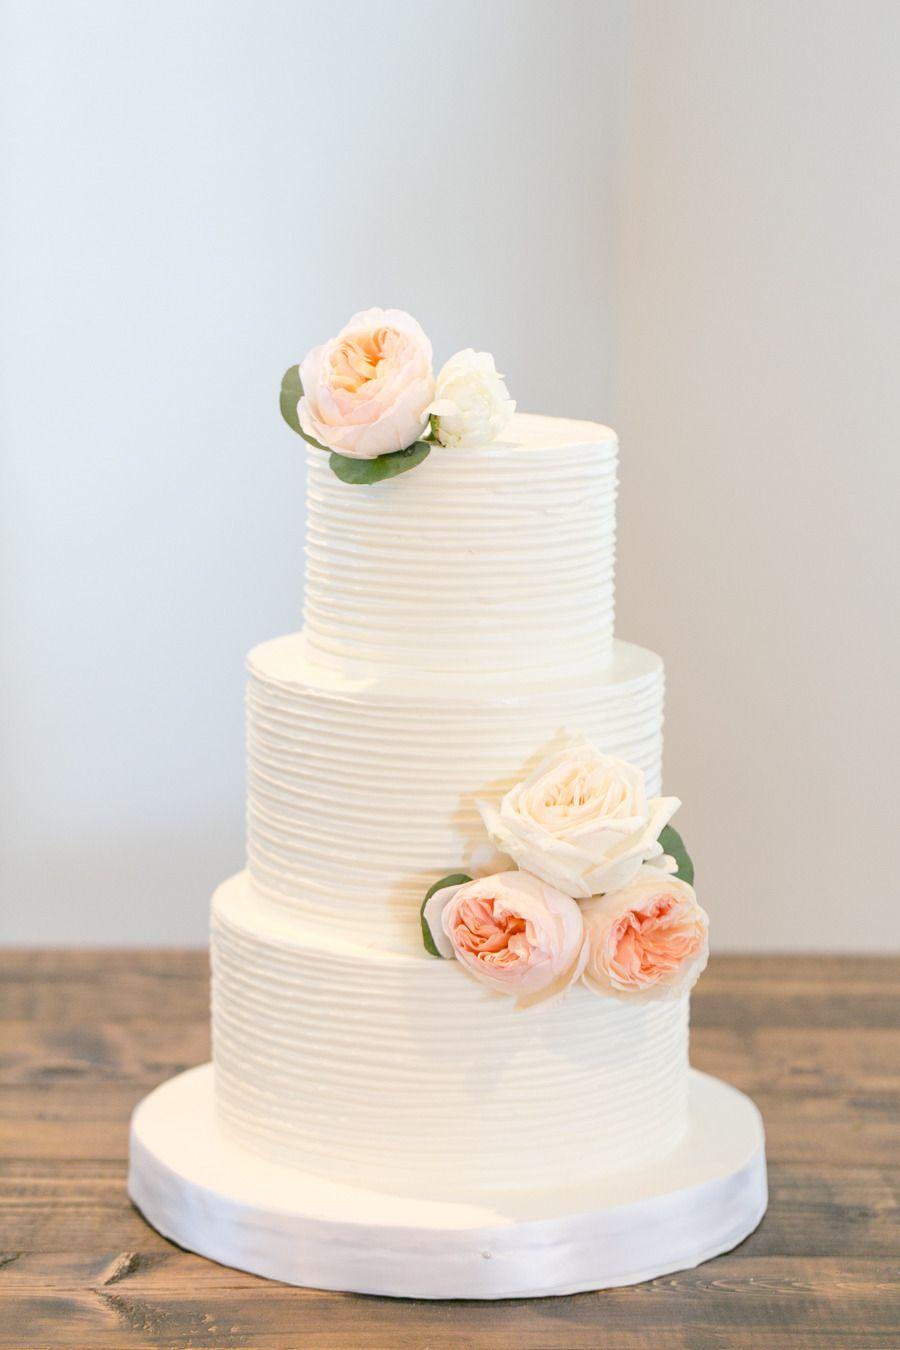 Boho Chic Travel-Themed Orlando Wedding | Floral designs, Cake and ...